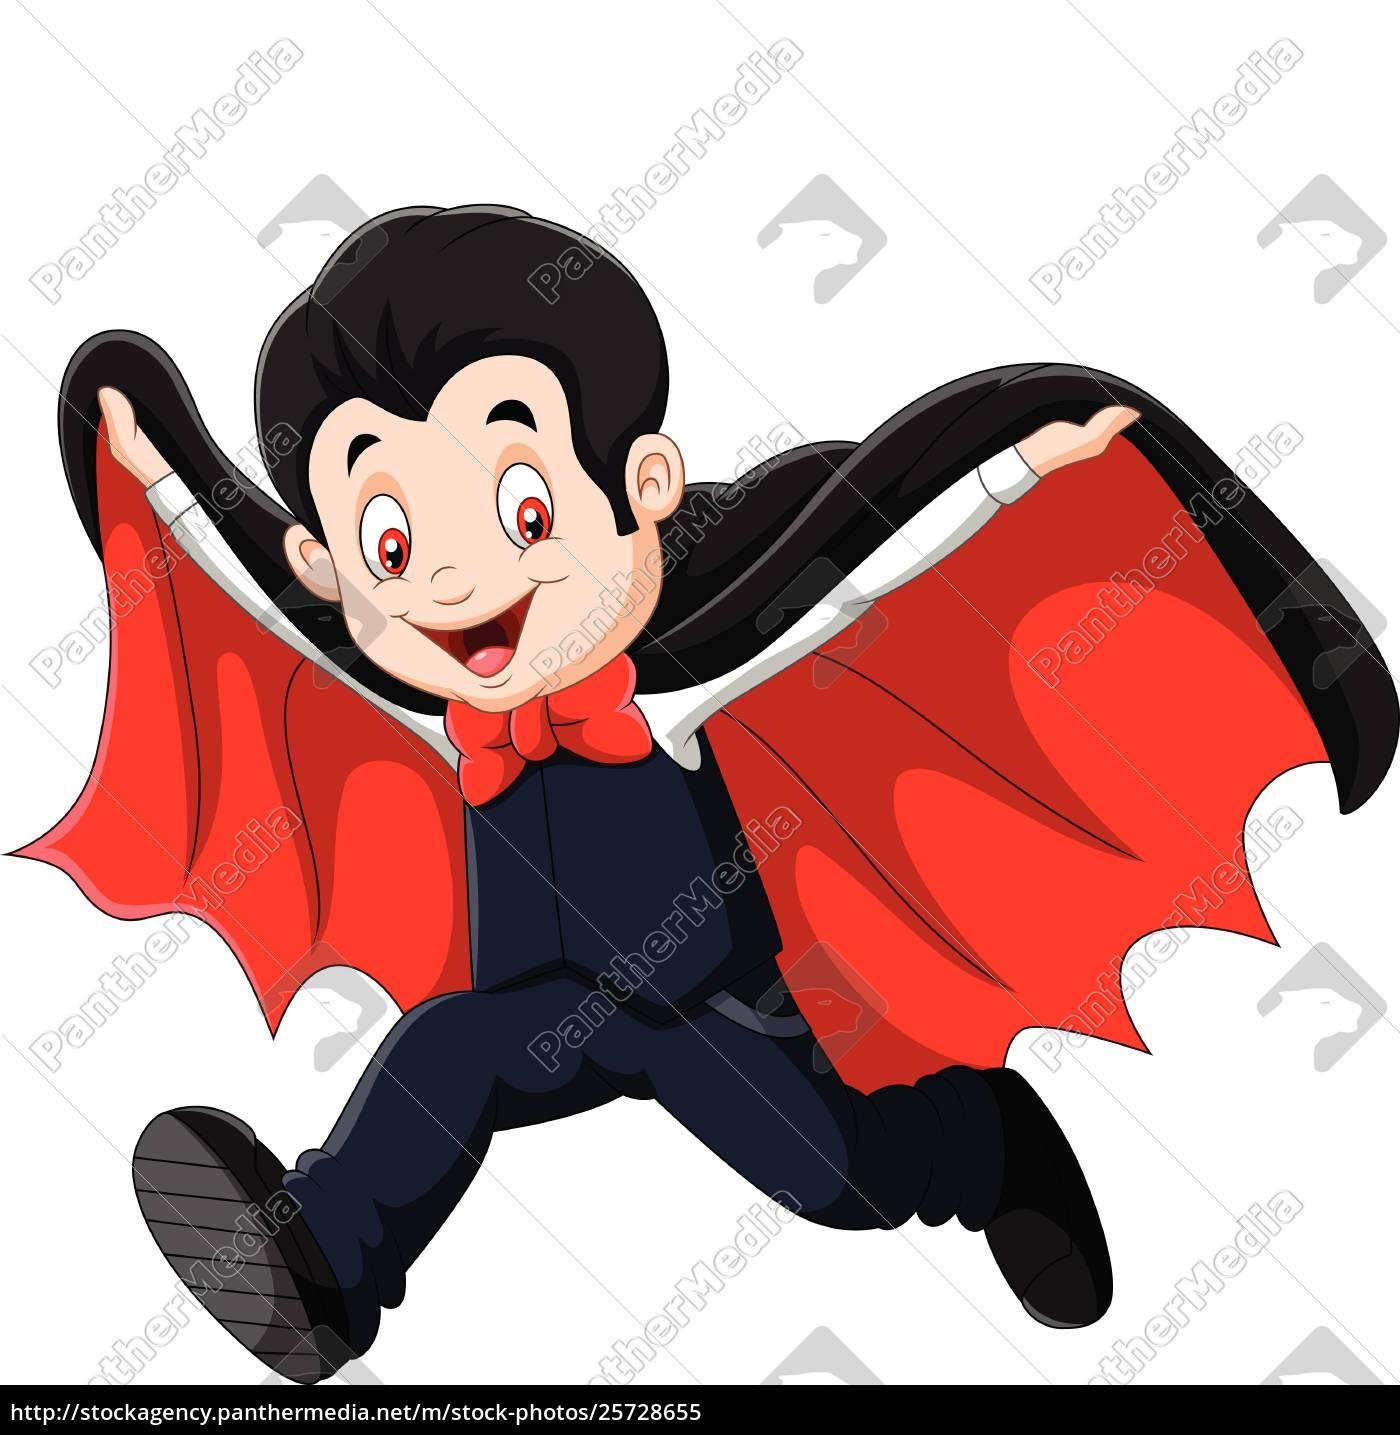 Cartoon Happy Vampire Isolated On White Background Stock Photo 25728655 Panthermedia Stock Agency